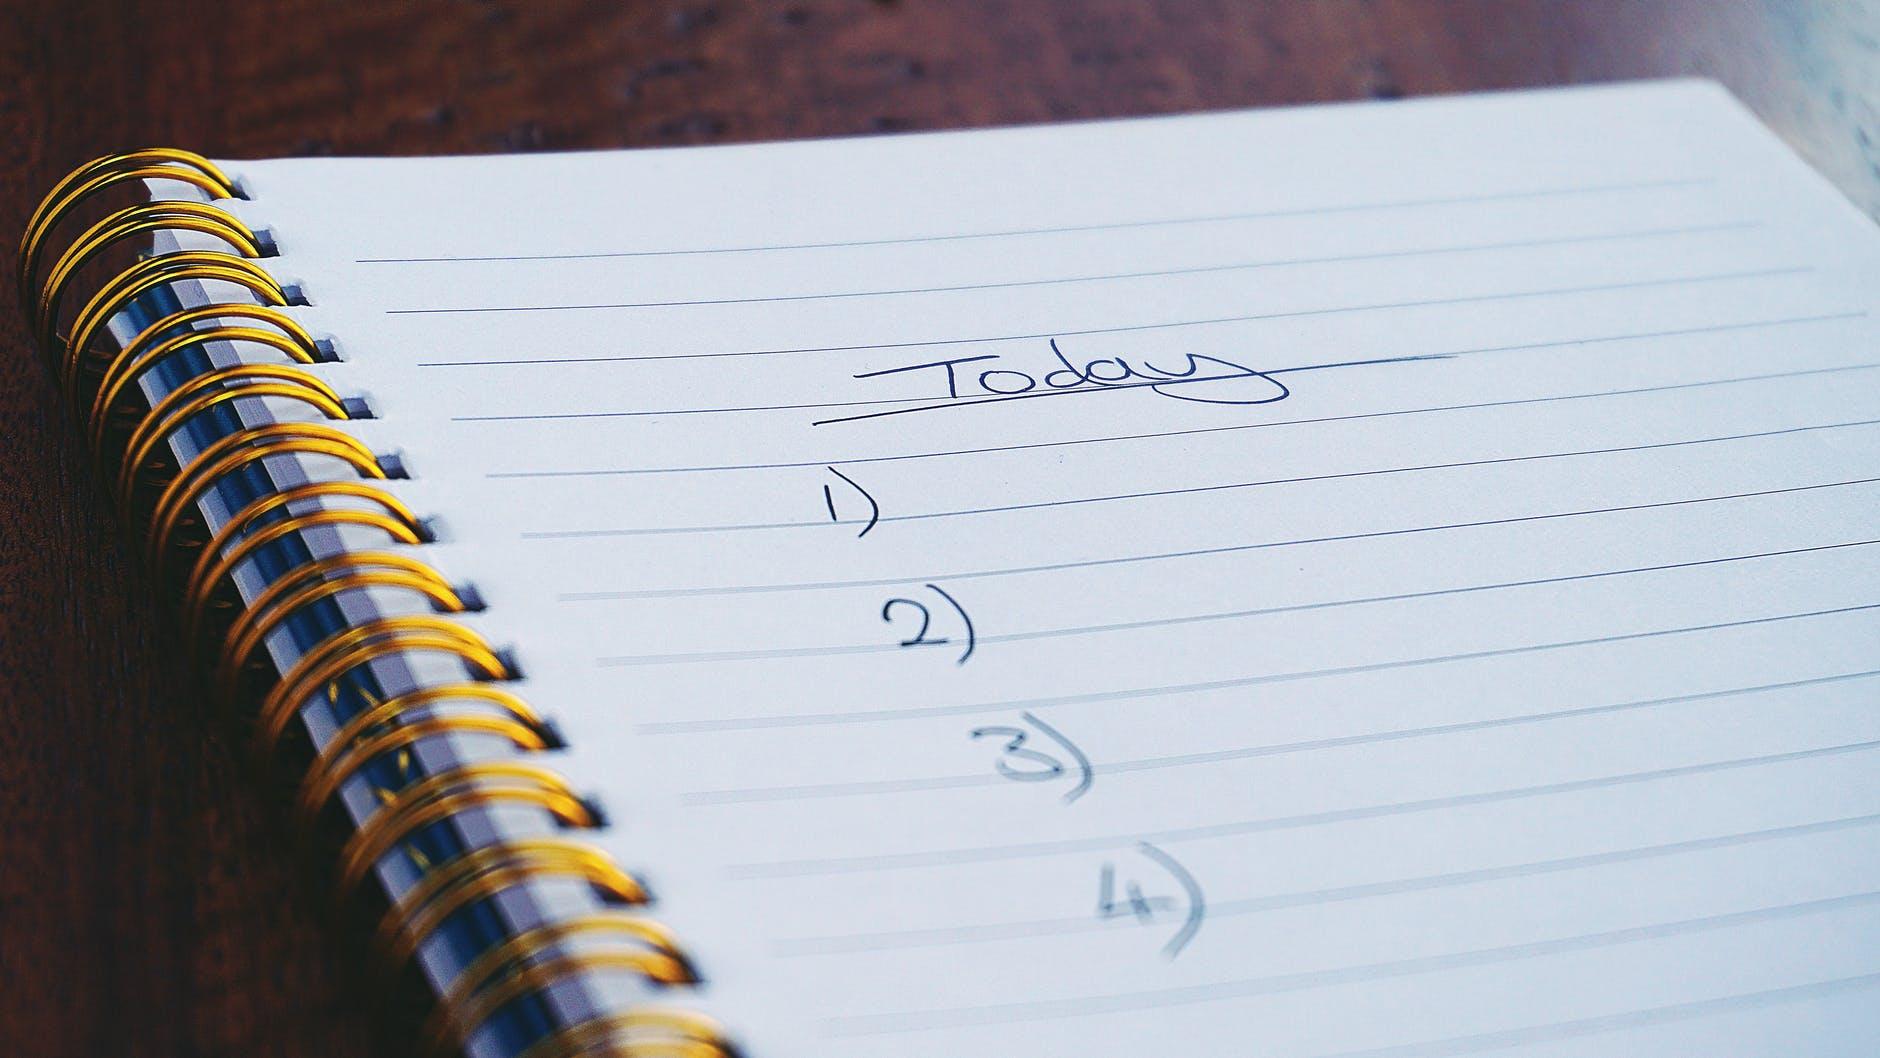 【Excel情境應用】依指定條件,將日期標上顏色(設定格式化條件)